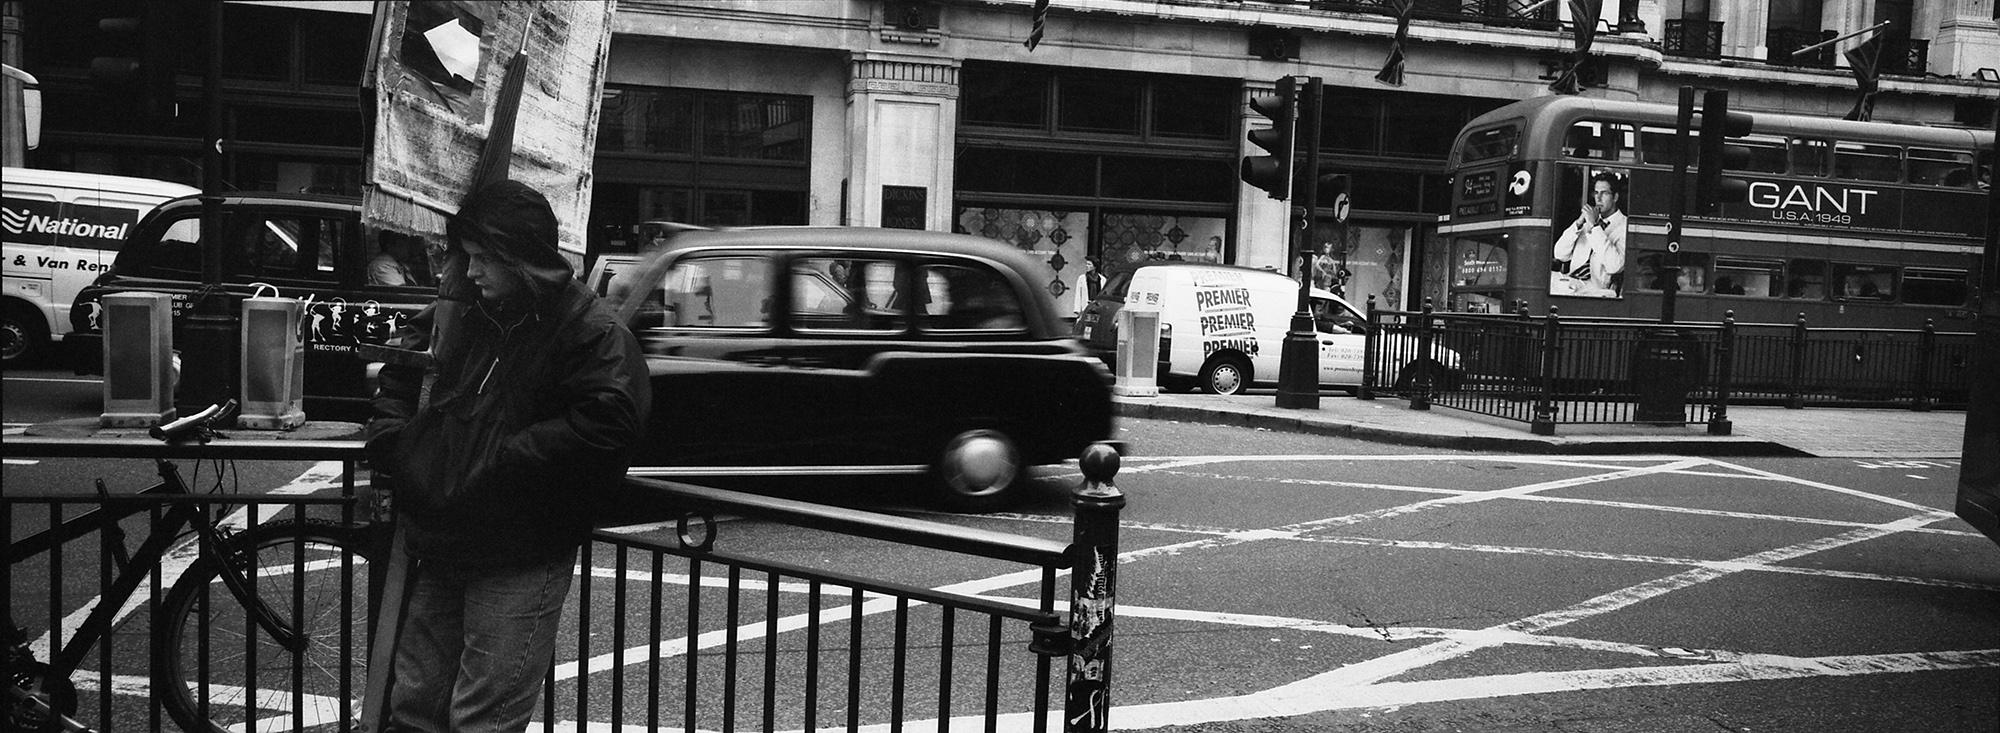 londres personal work Hasselblad xpan trip Kodak palicula blanco y negro reportaje